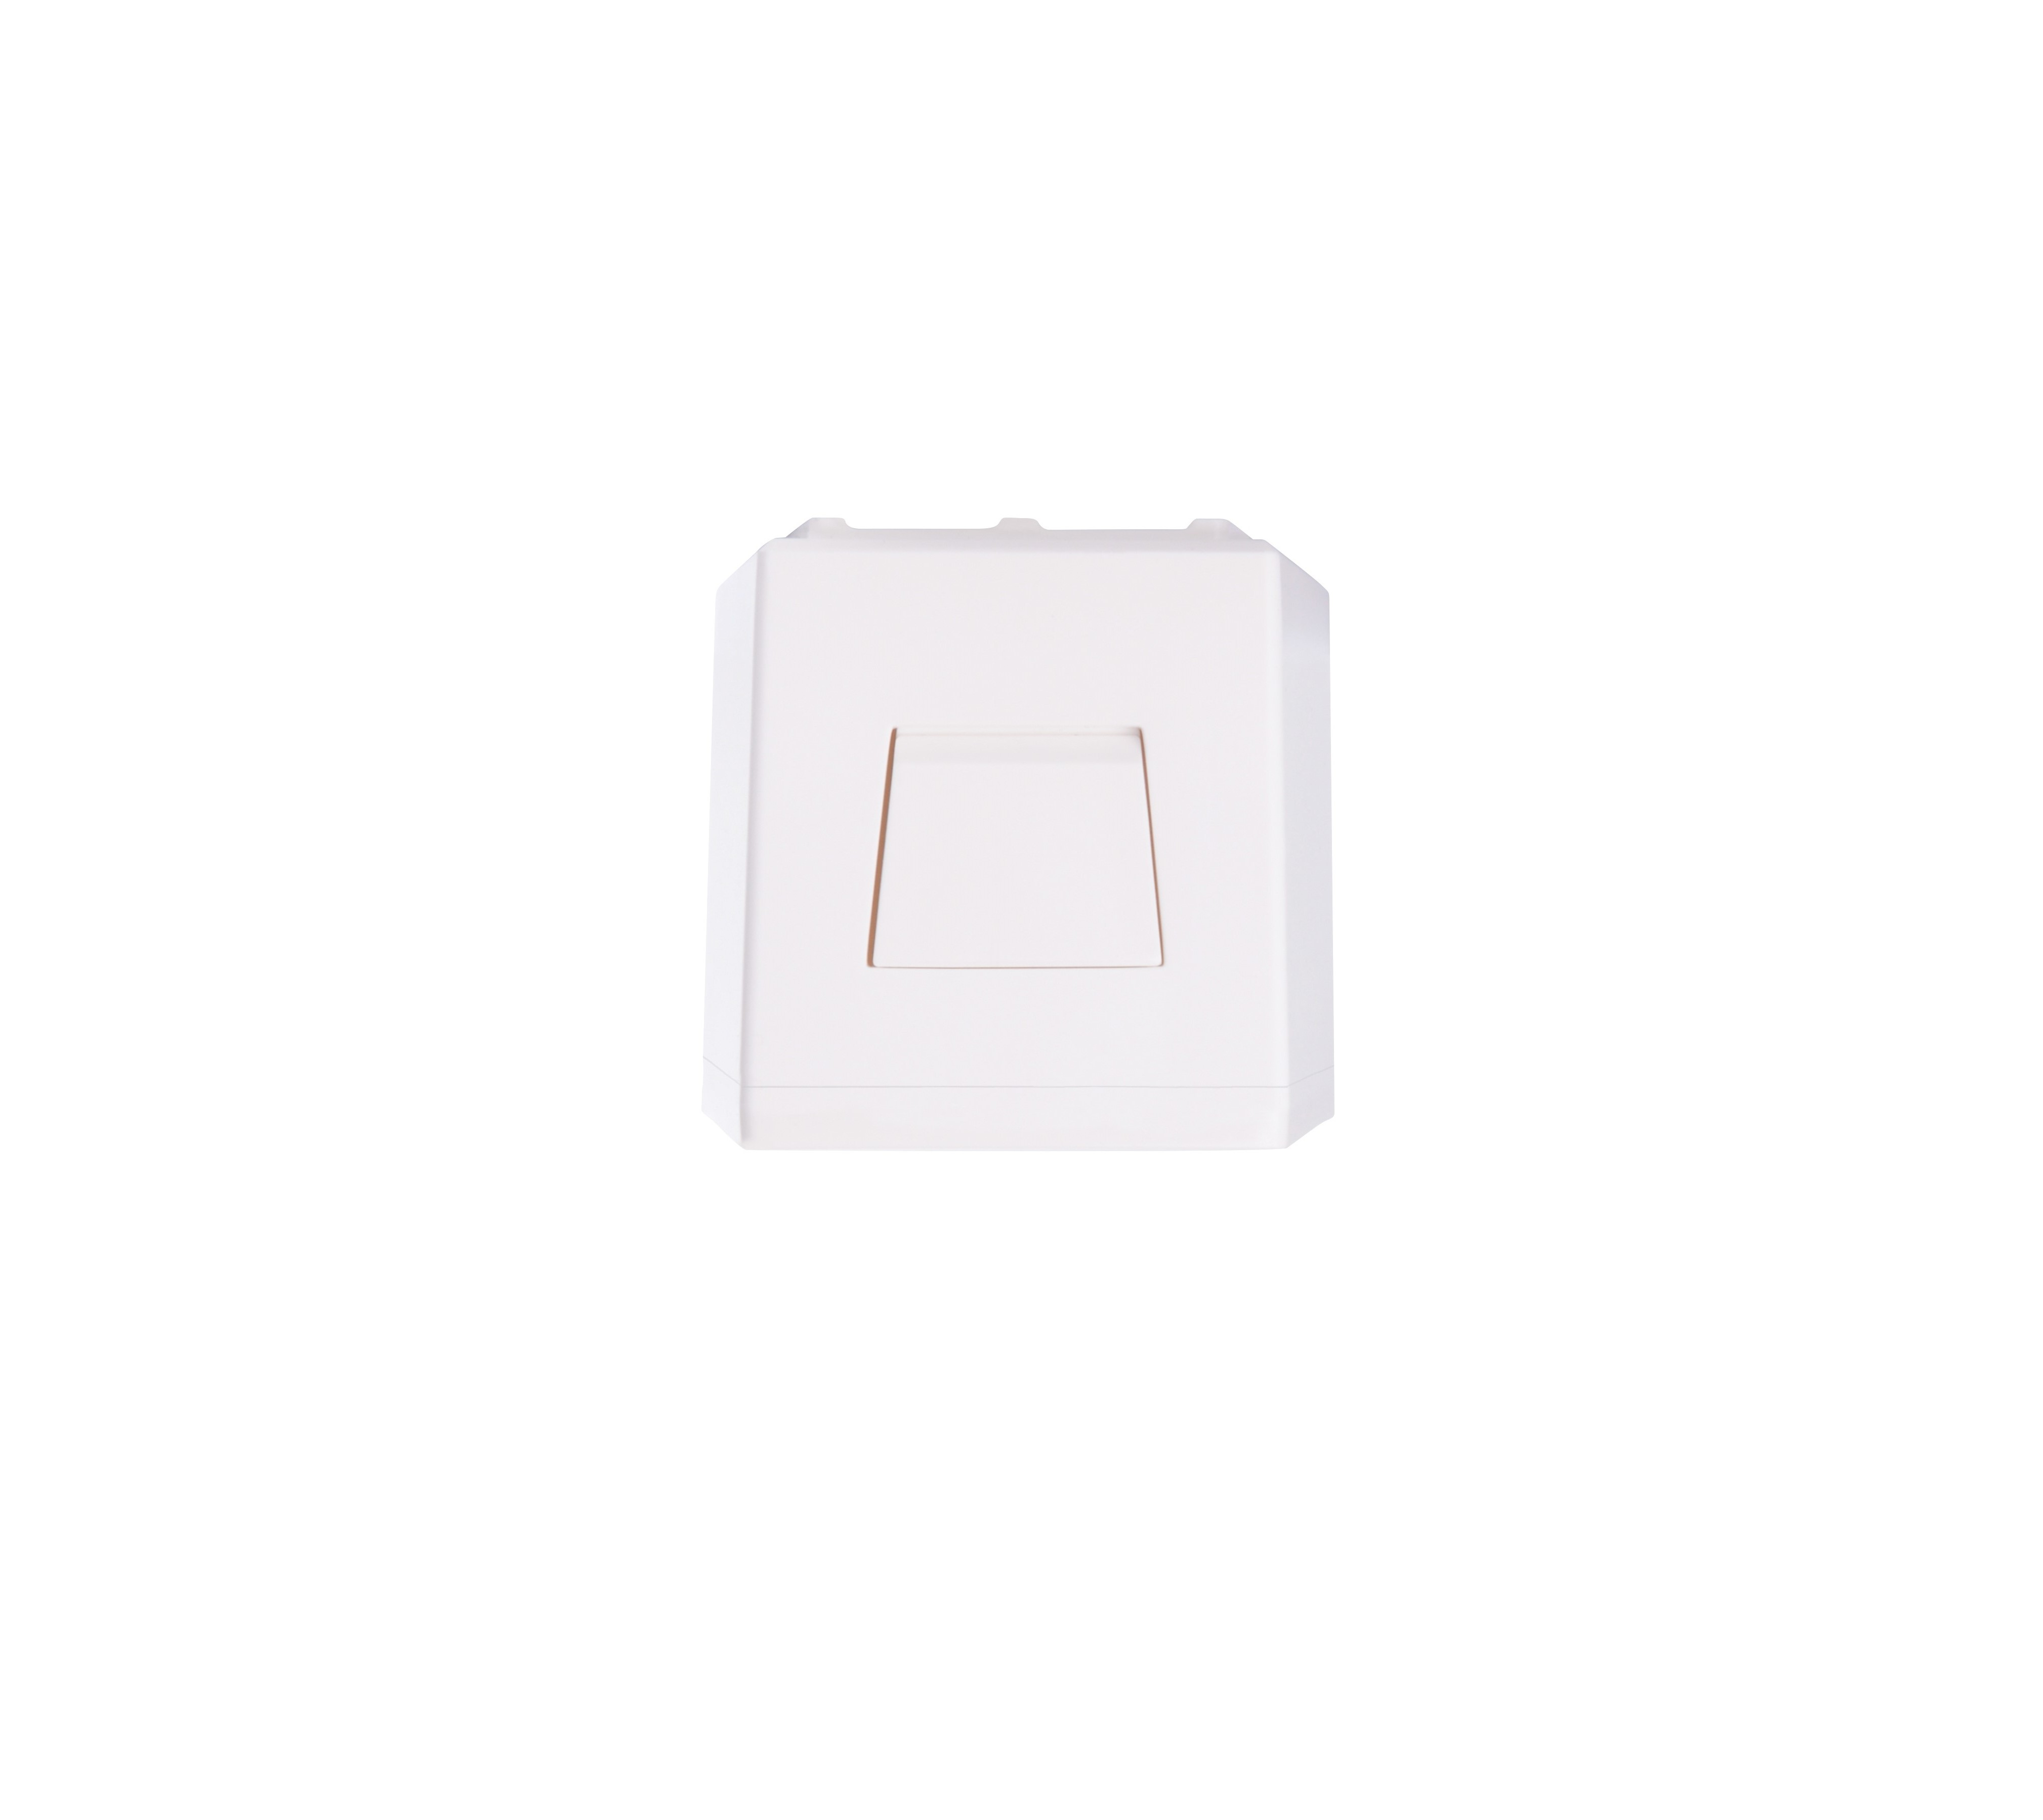 Lampa emergenta led Intelight 94504   3h mentinut test automat 1